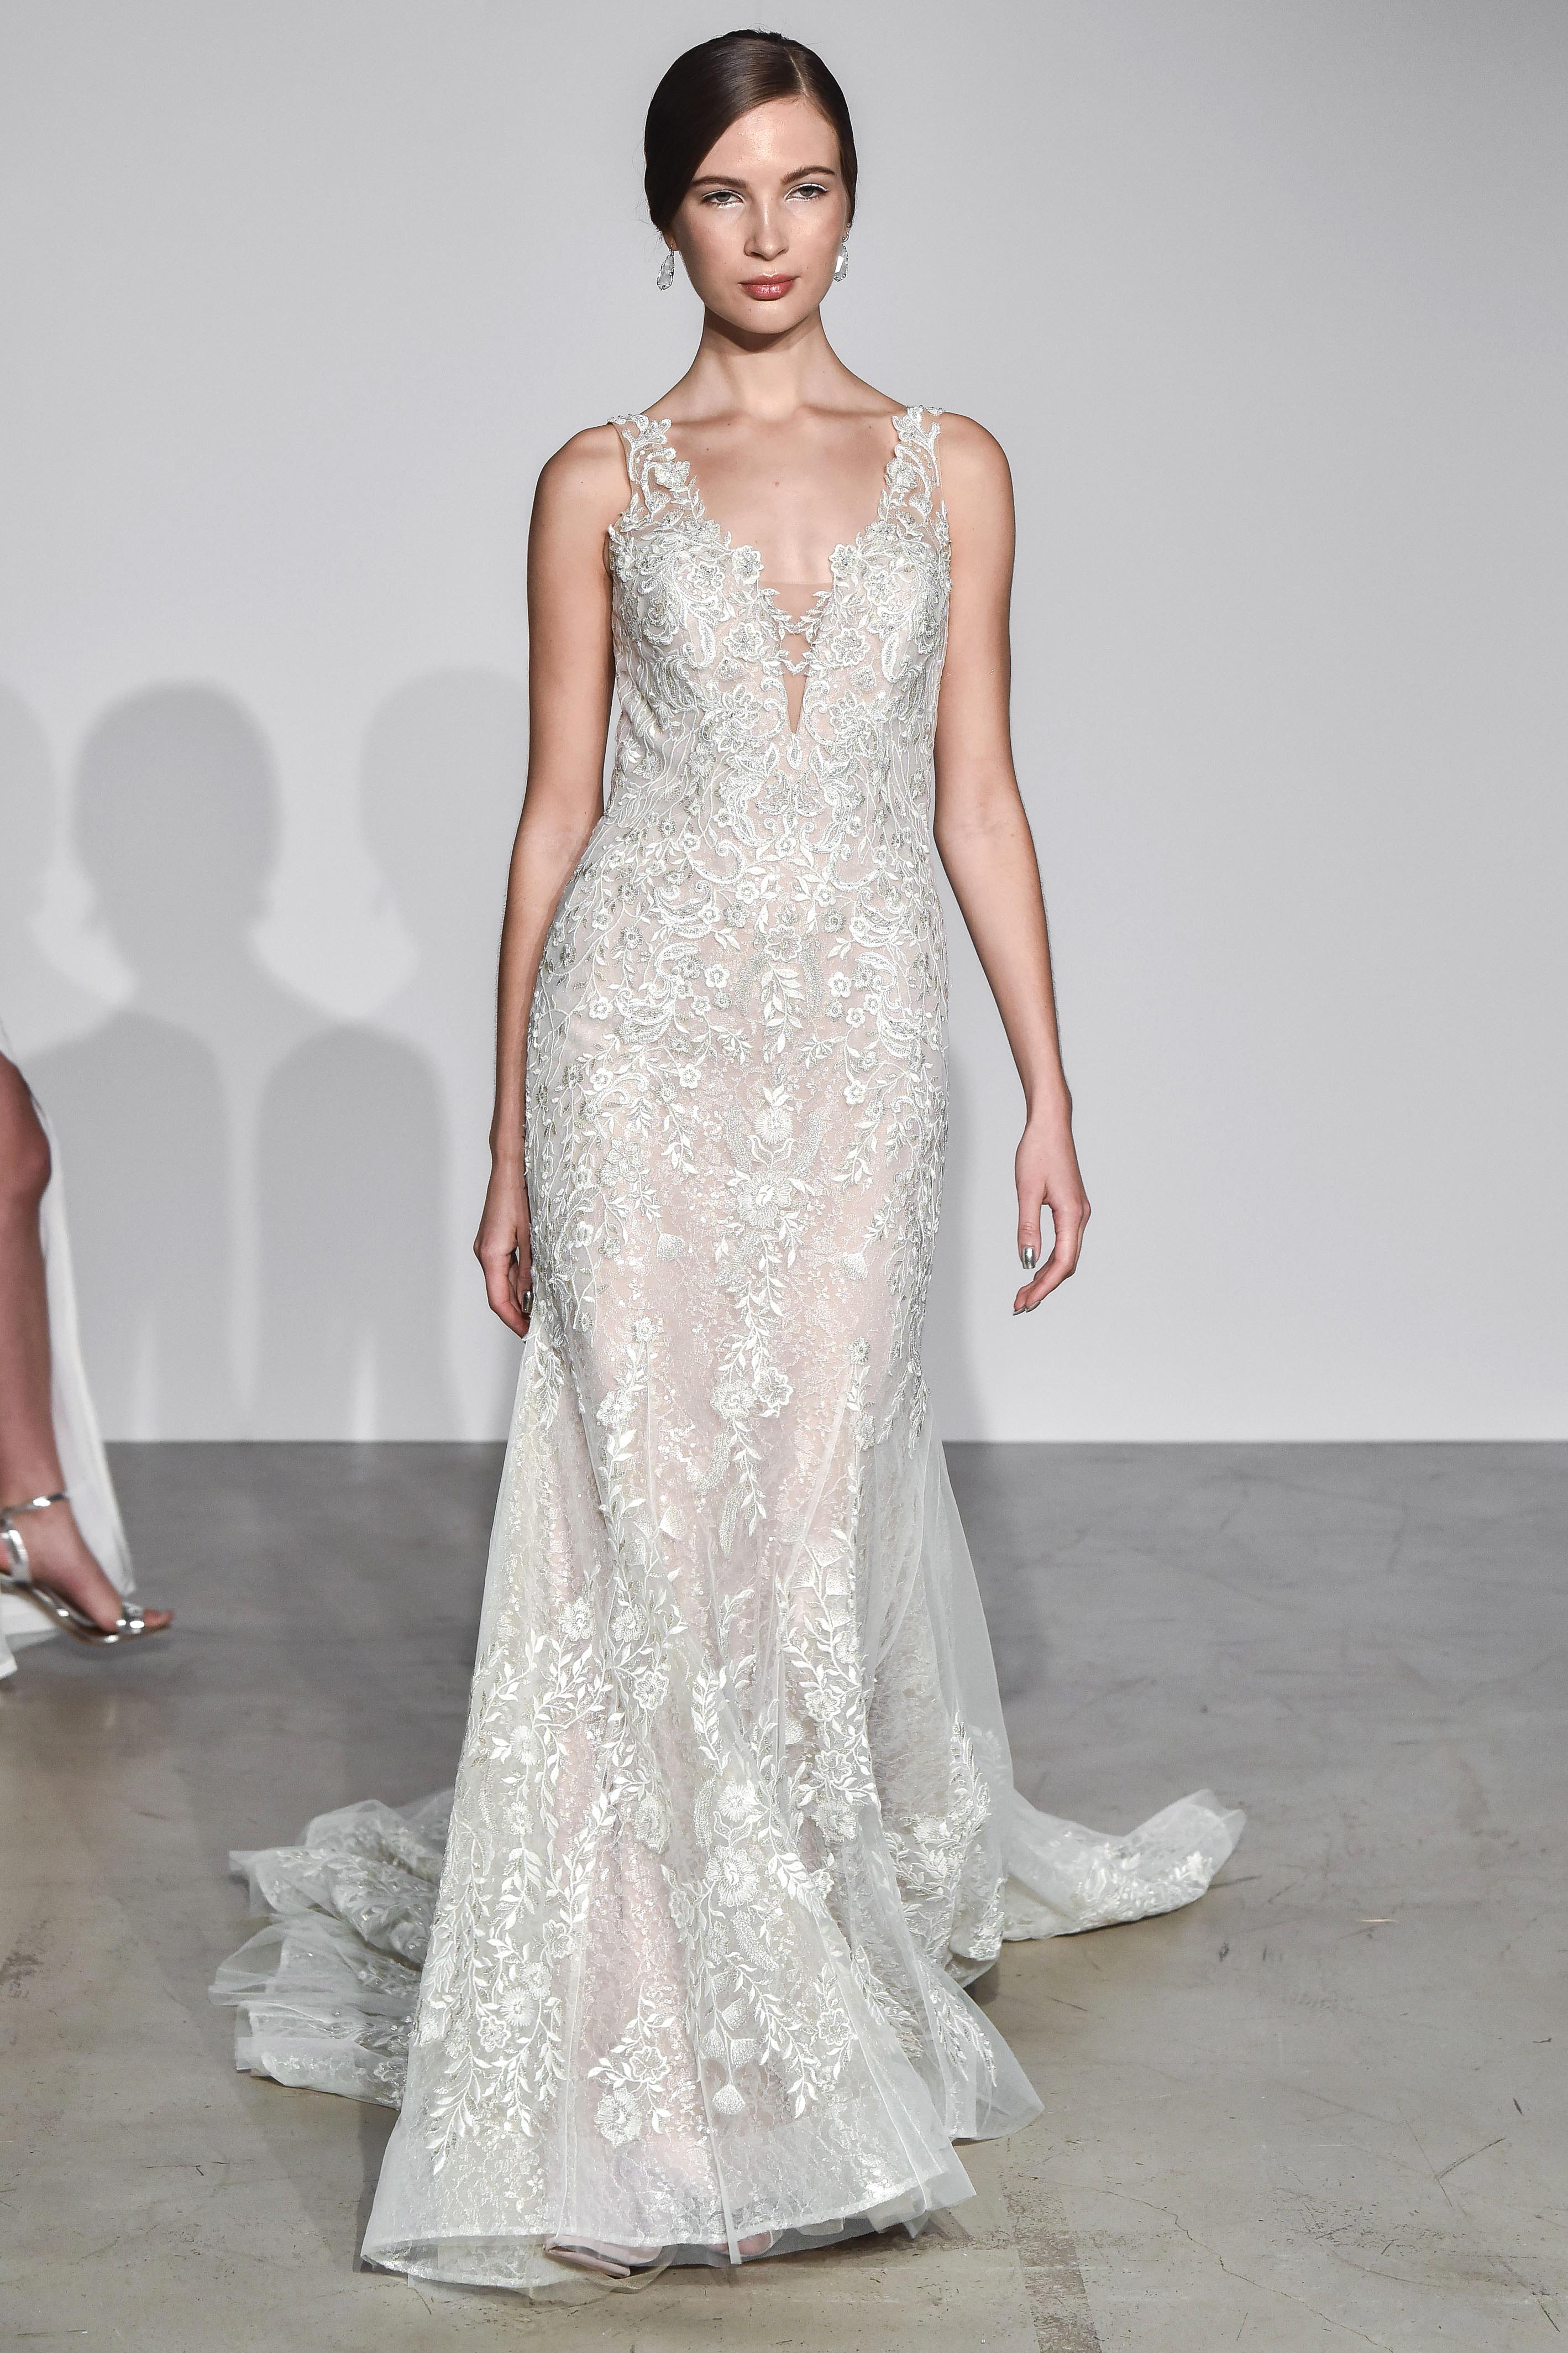 justin alexander fall 2018 v-neck lace wedding dress